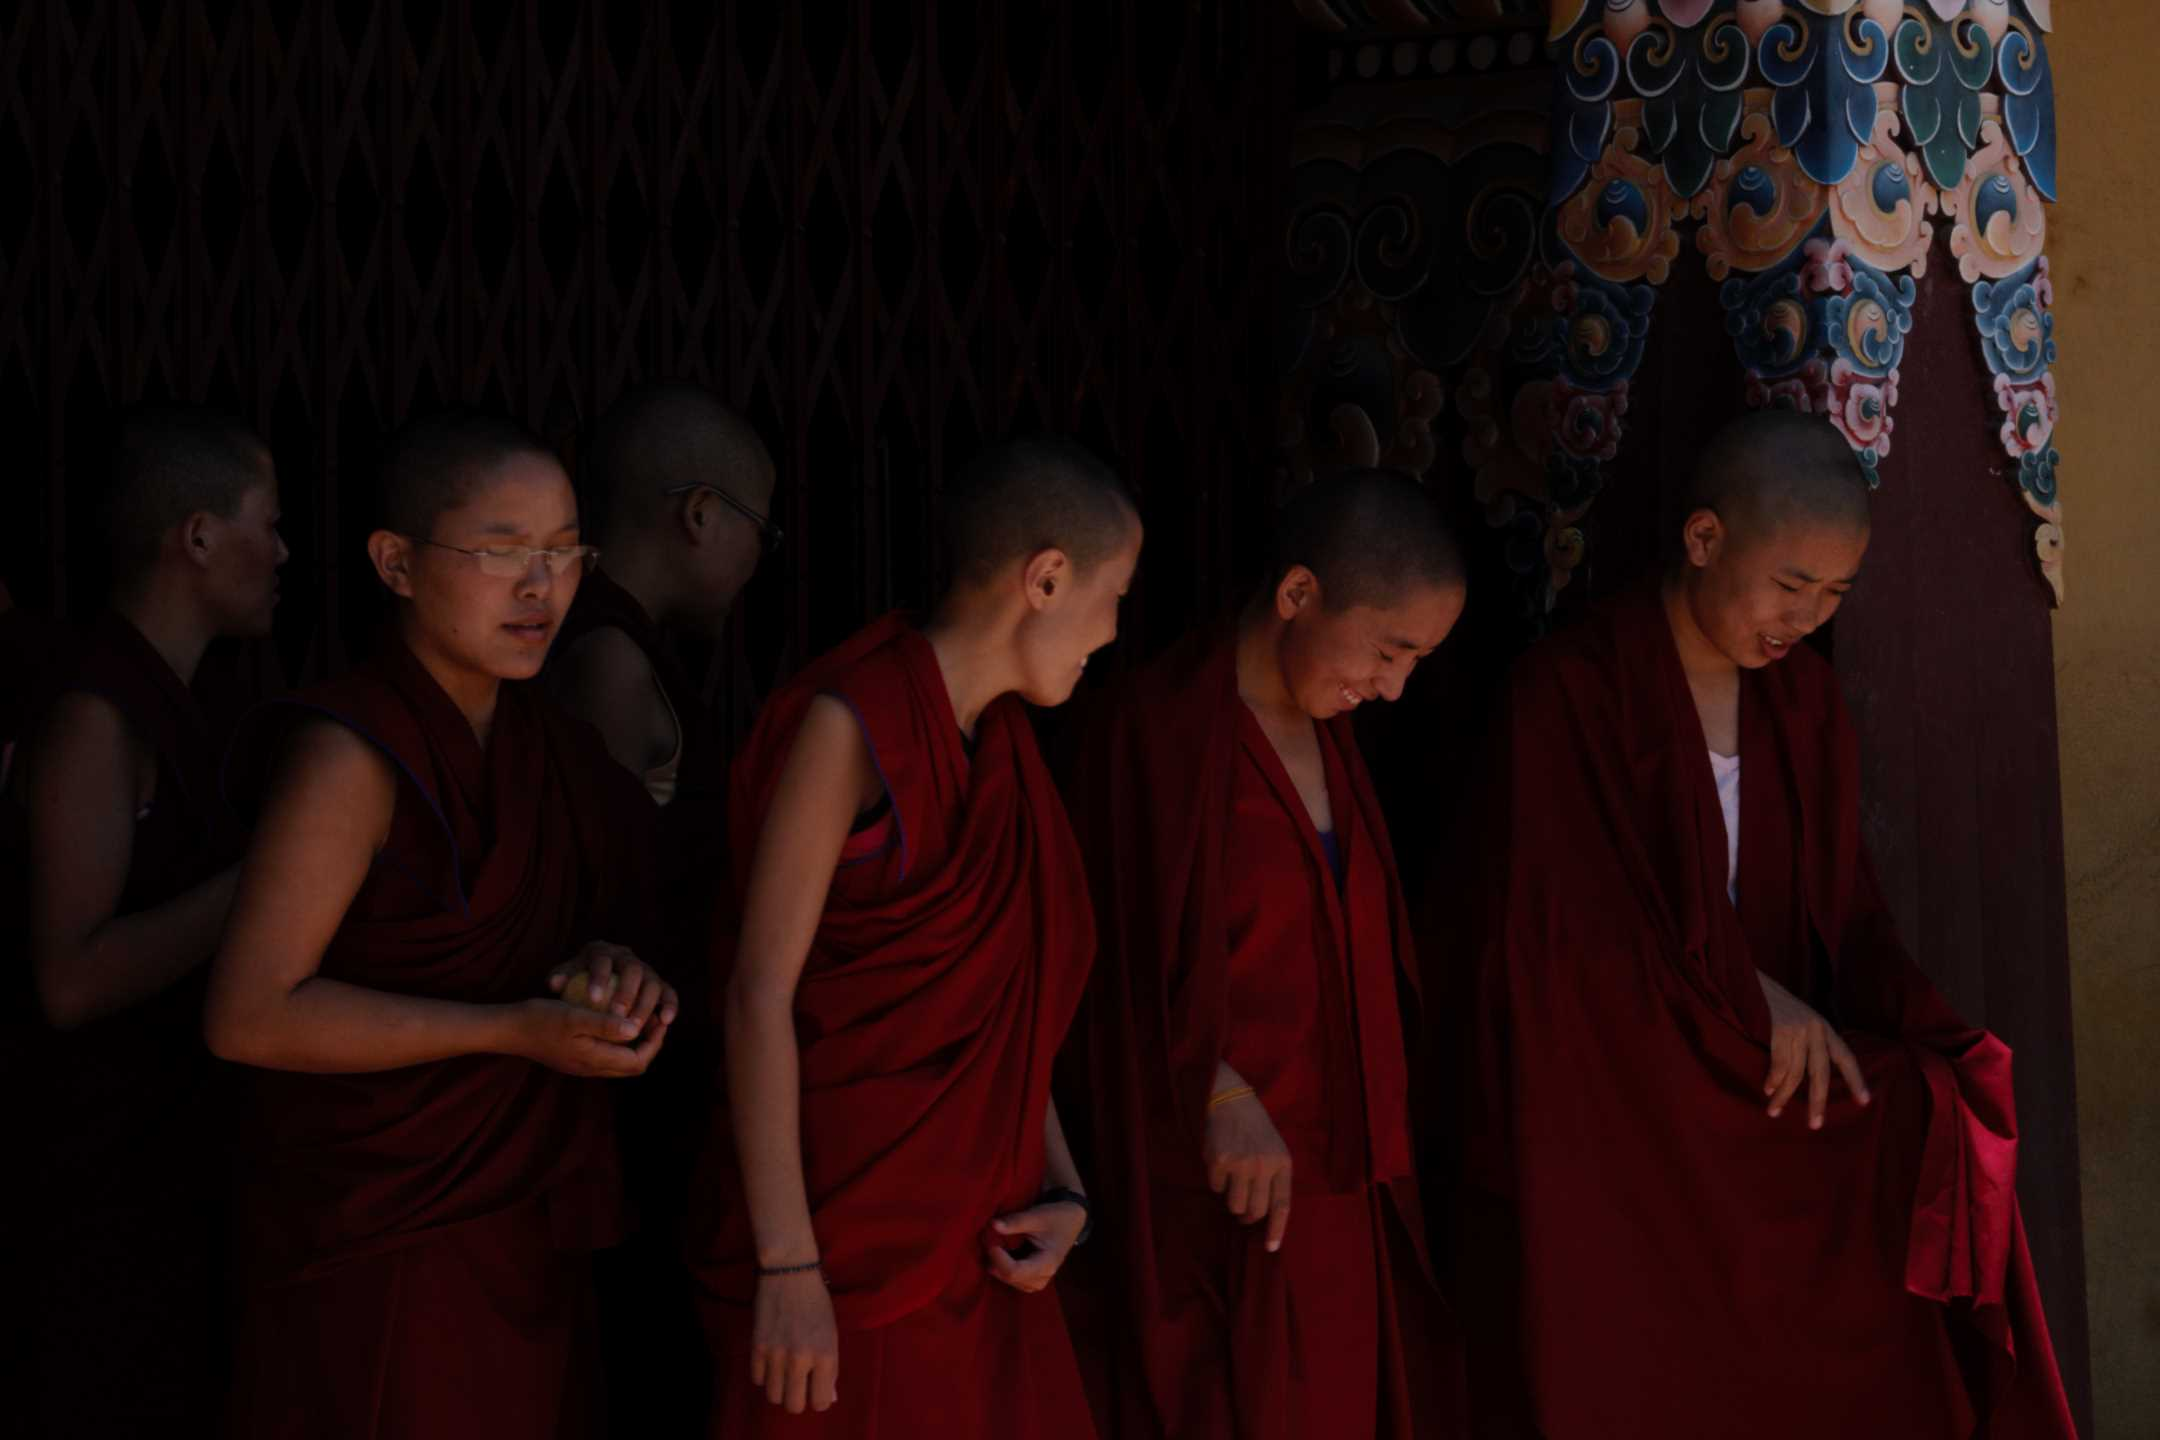 Monks at Neydo monastery